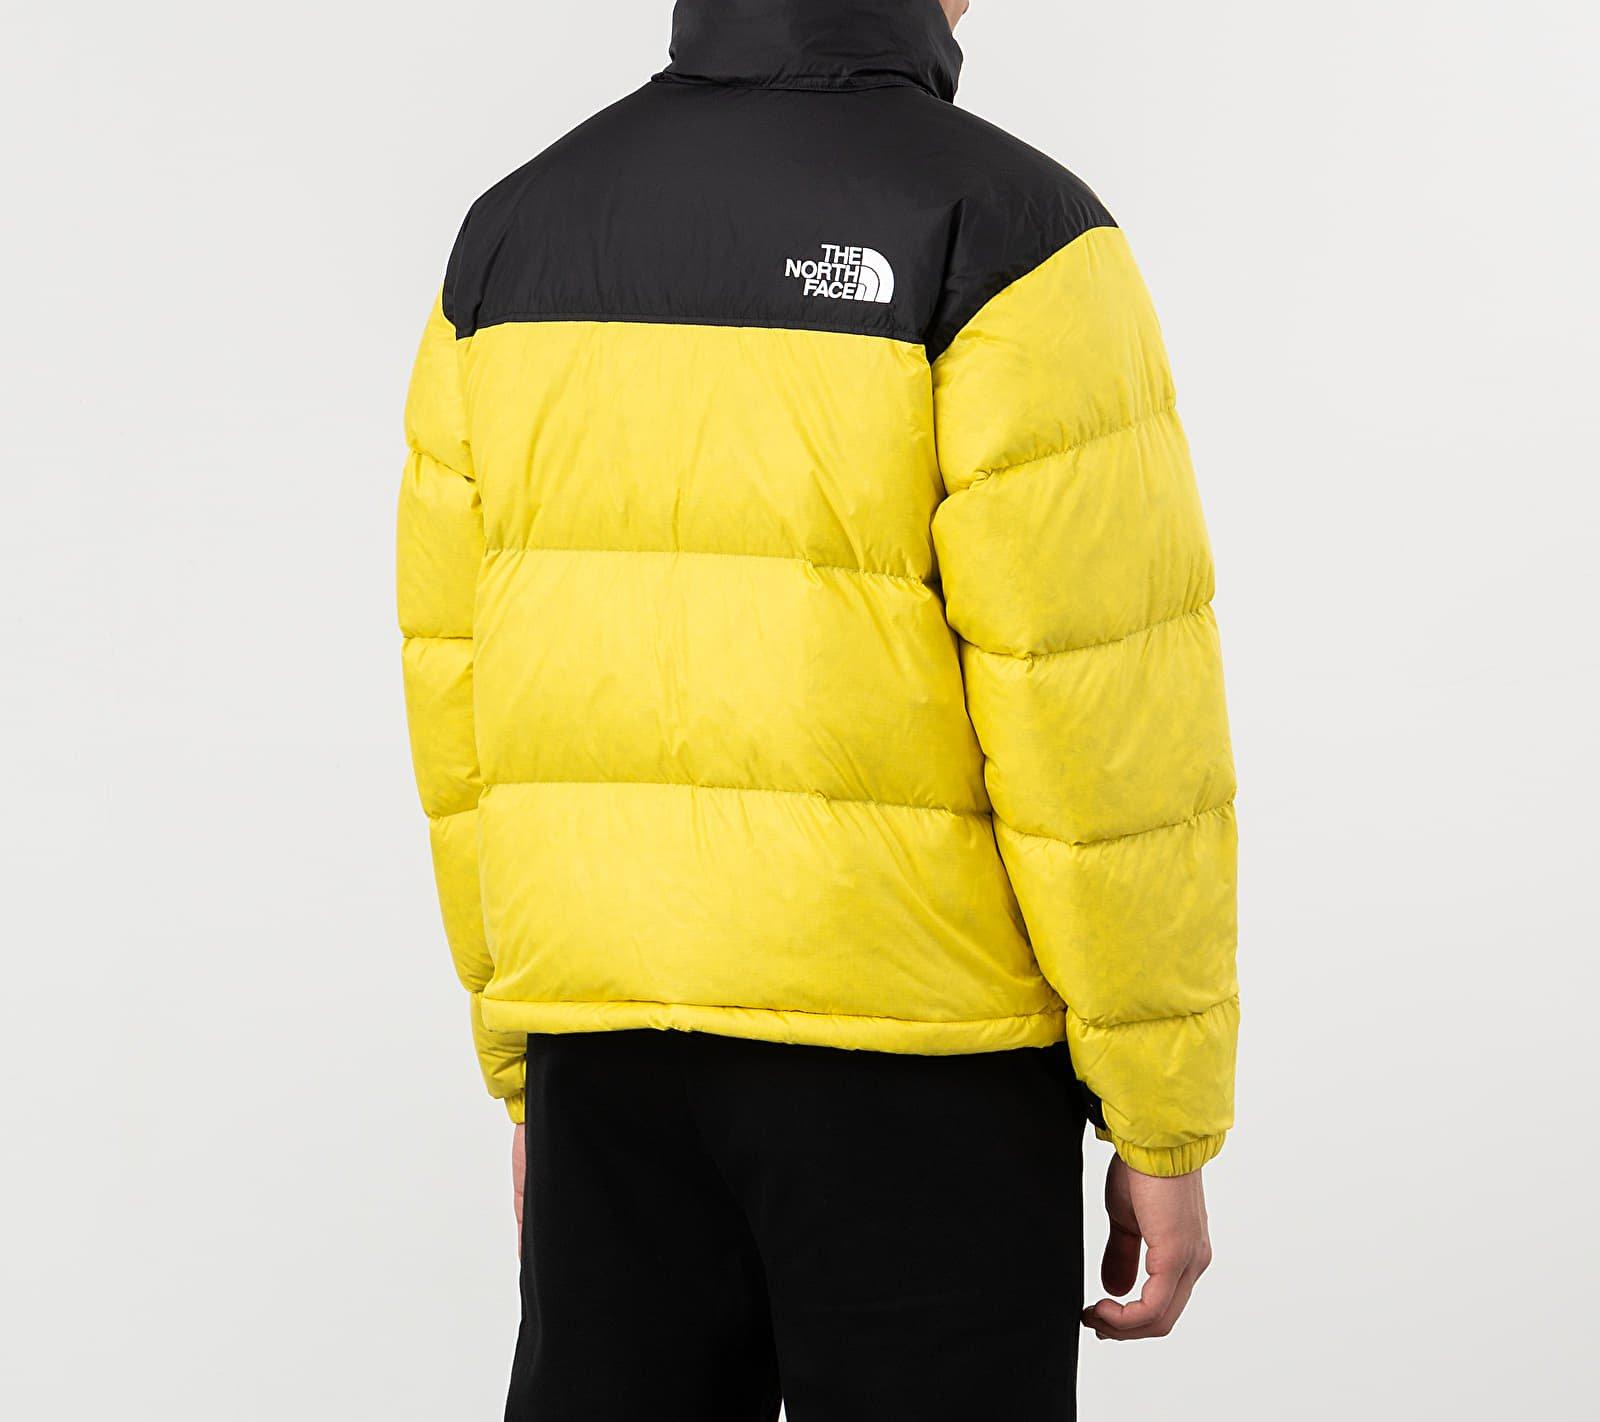 The North Face 1996 Retro Nuptse Jacket Lemon, Yellow